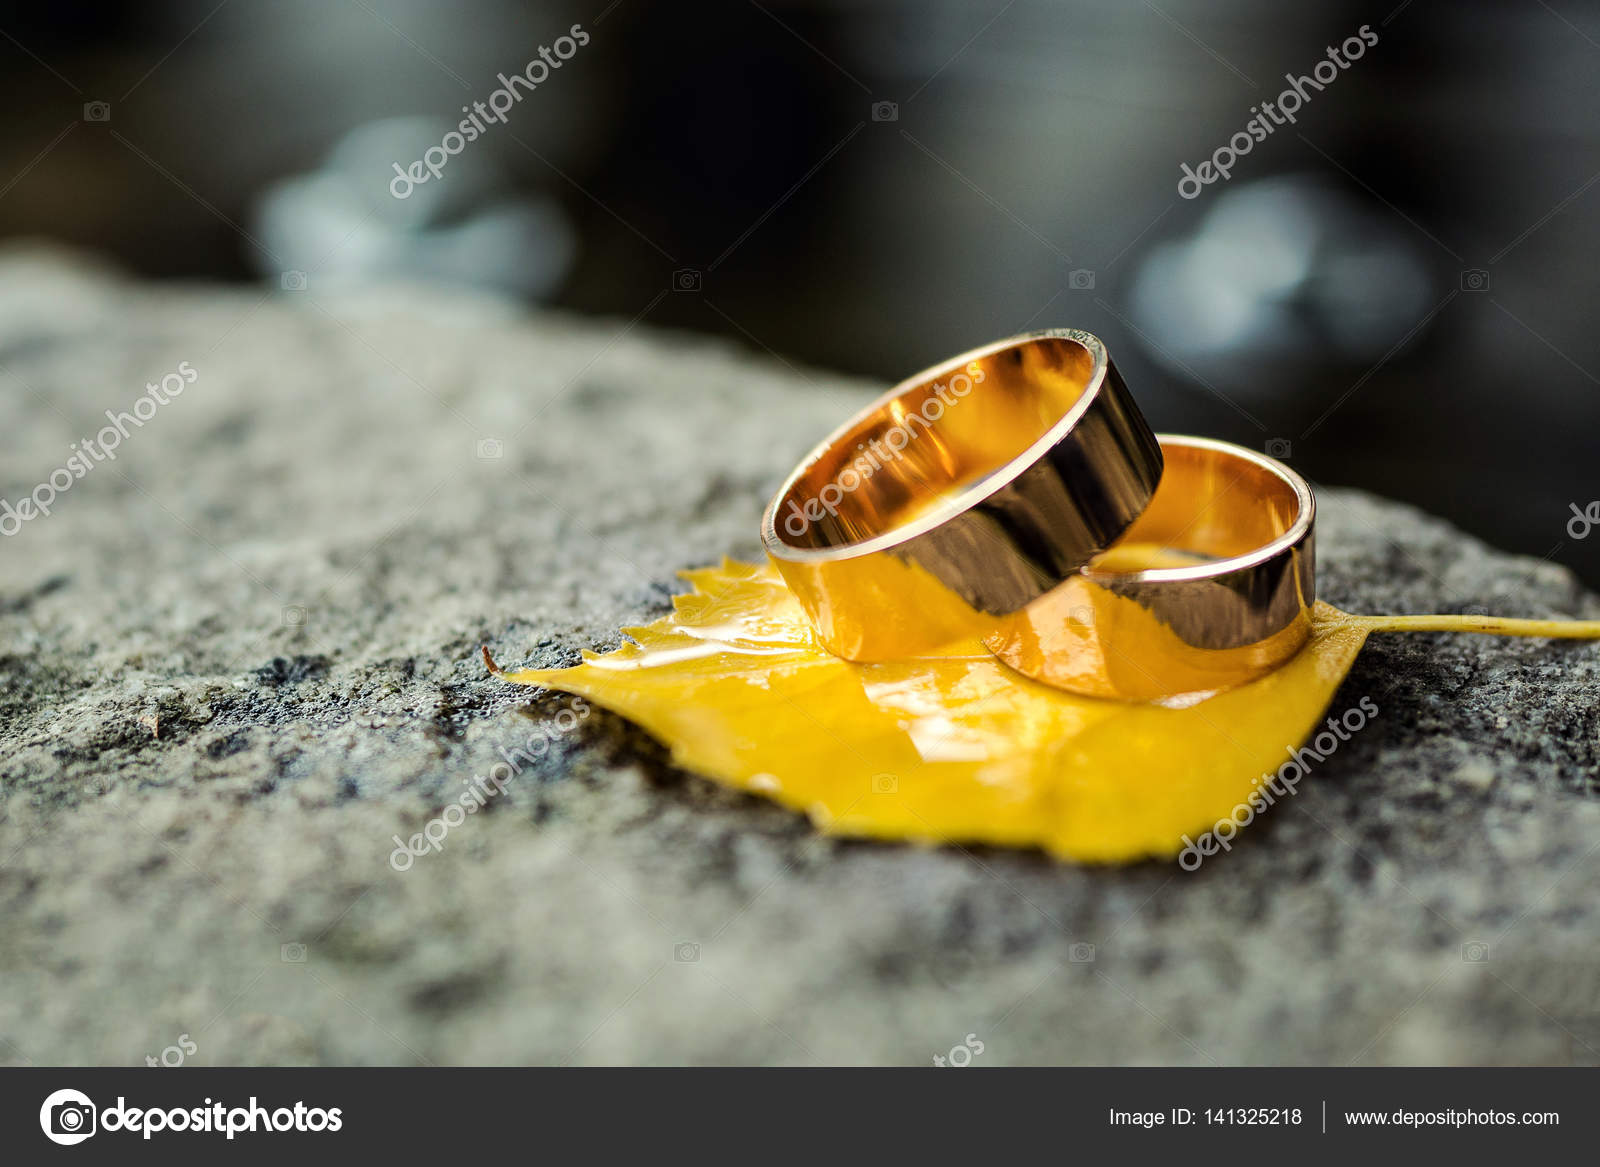 beautiful wedding rings on a stone backgroundon autumn leaves